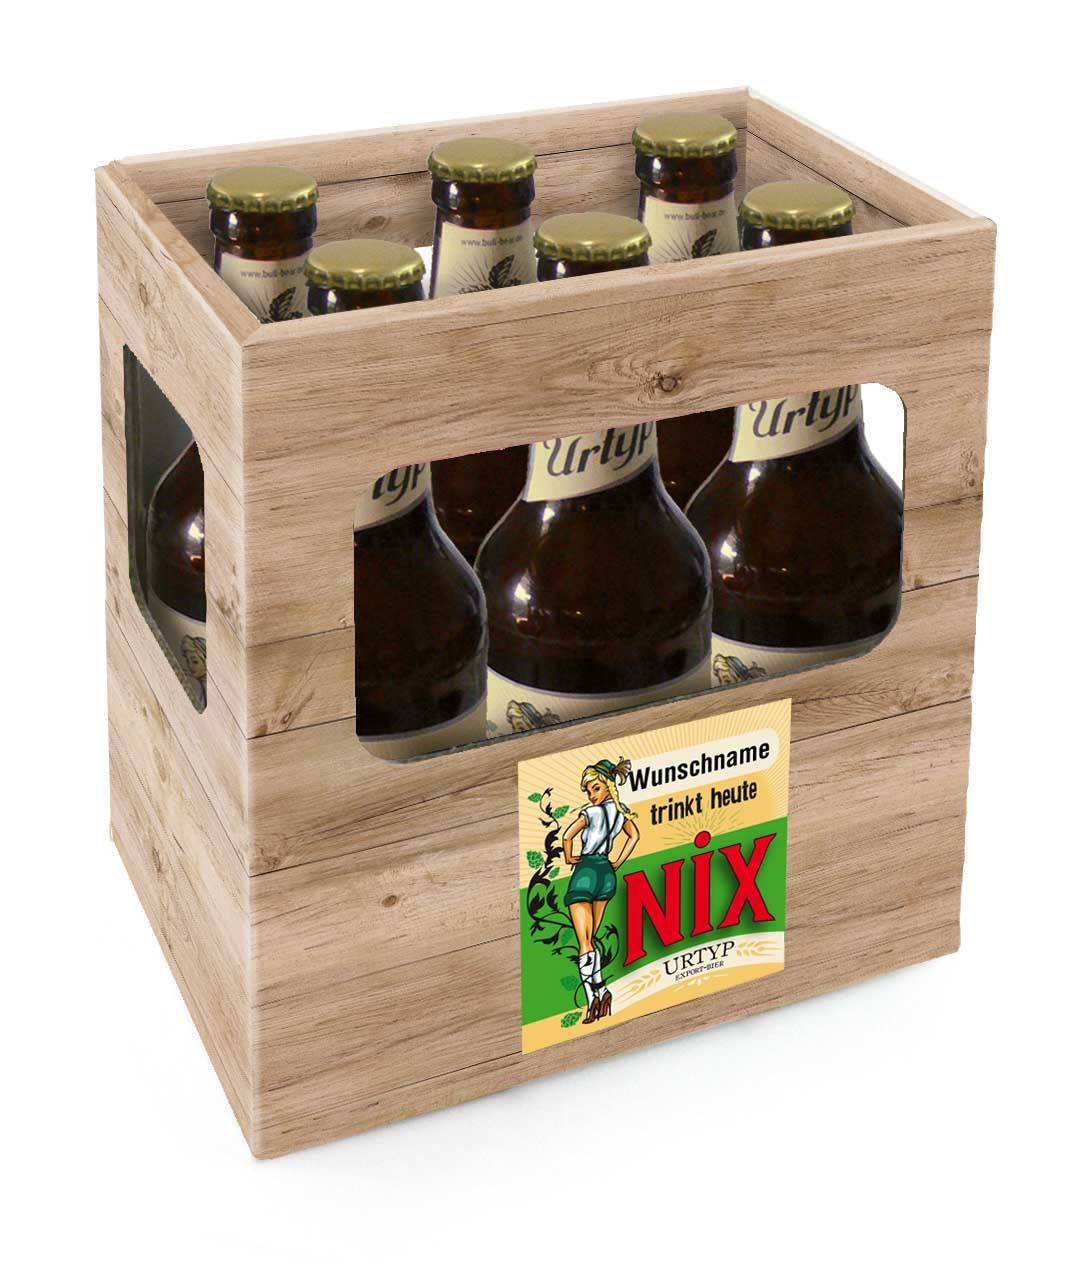 6er Bier Box Trinkt Heute Nix Namenseindruck Bull Bear De